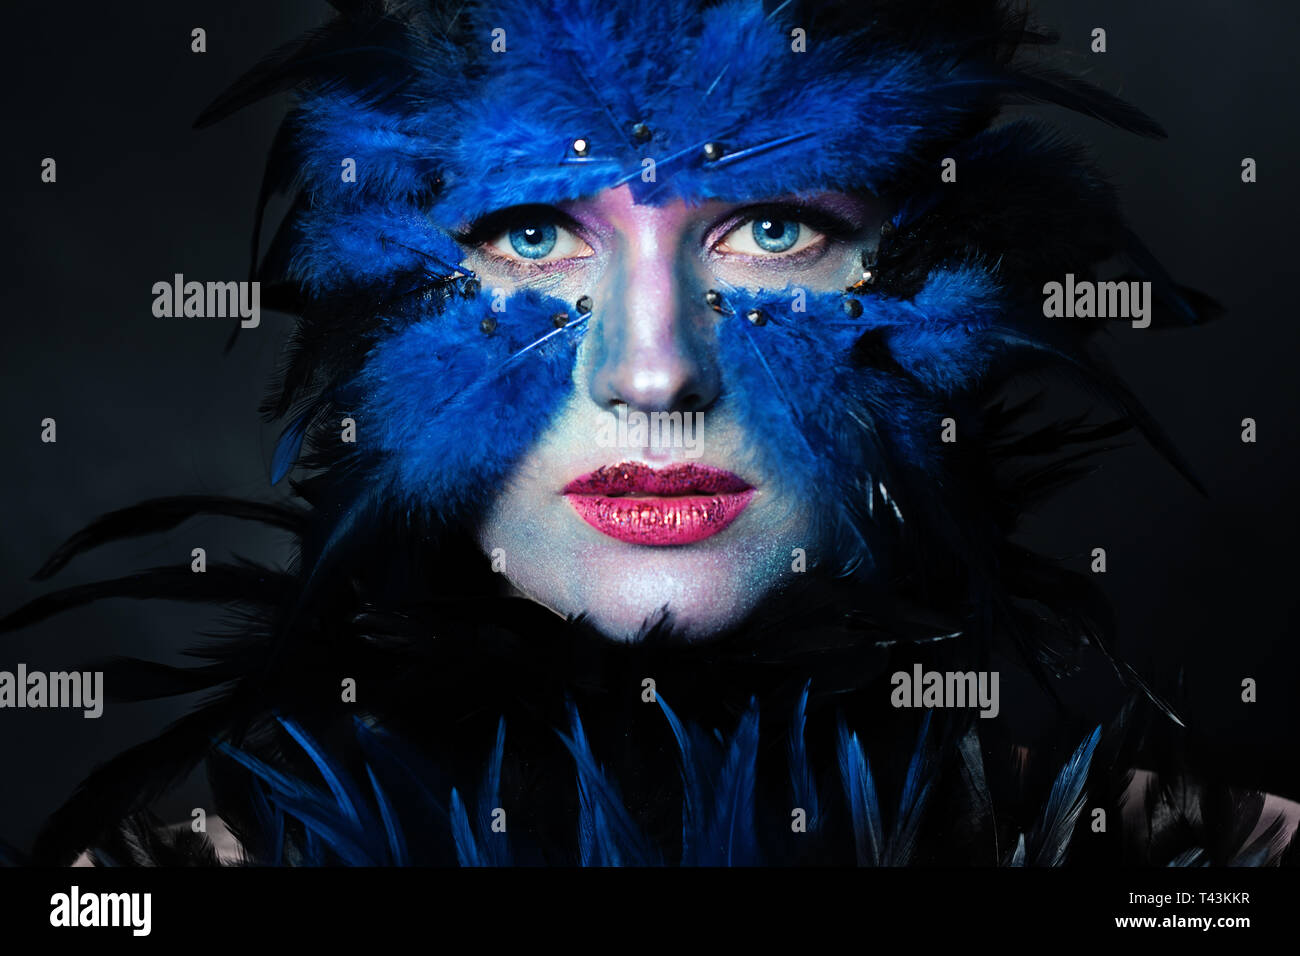 Bird Halloween Makeup.Woman With Halloween Makeup Model Face Bird Character With Blue And Black Feathers Stock Photo Alamy